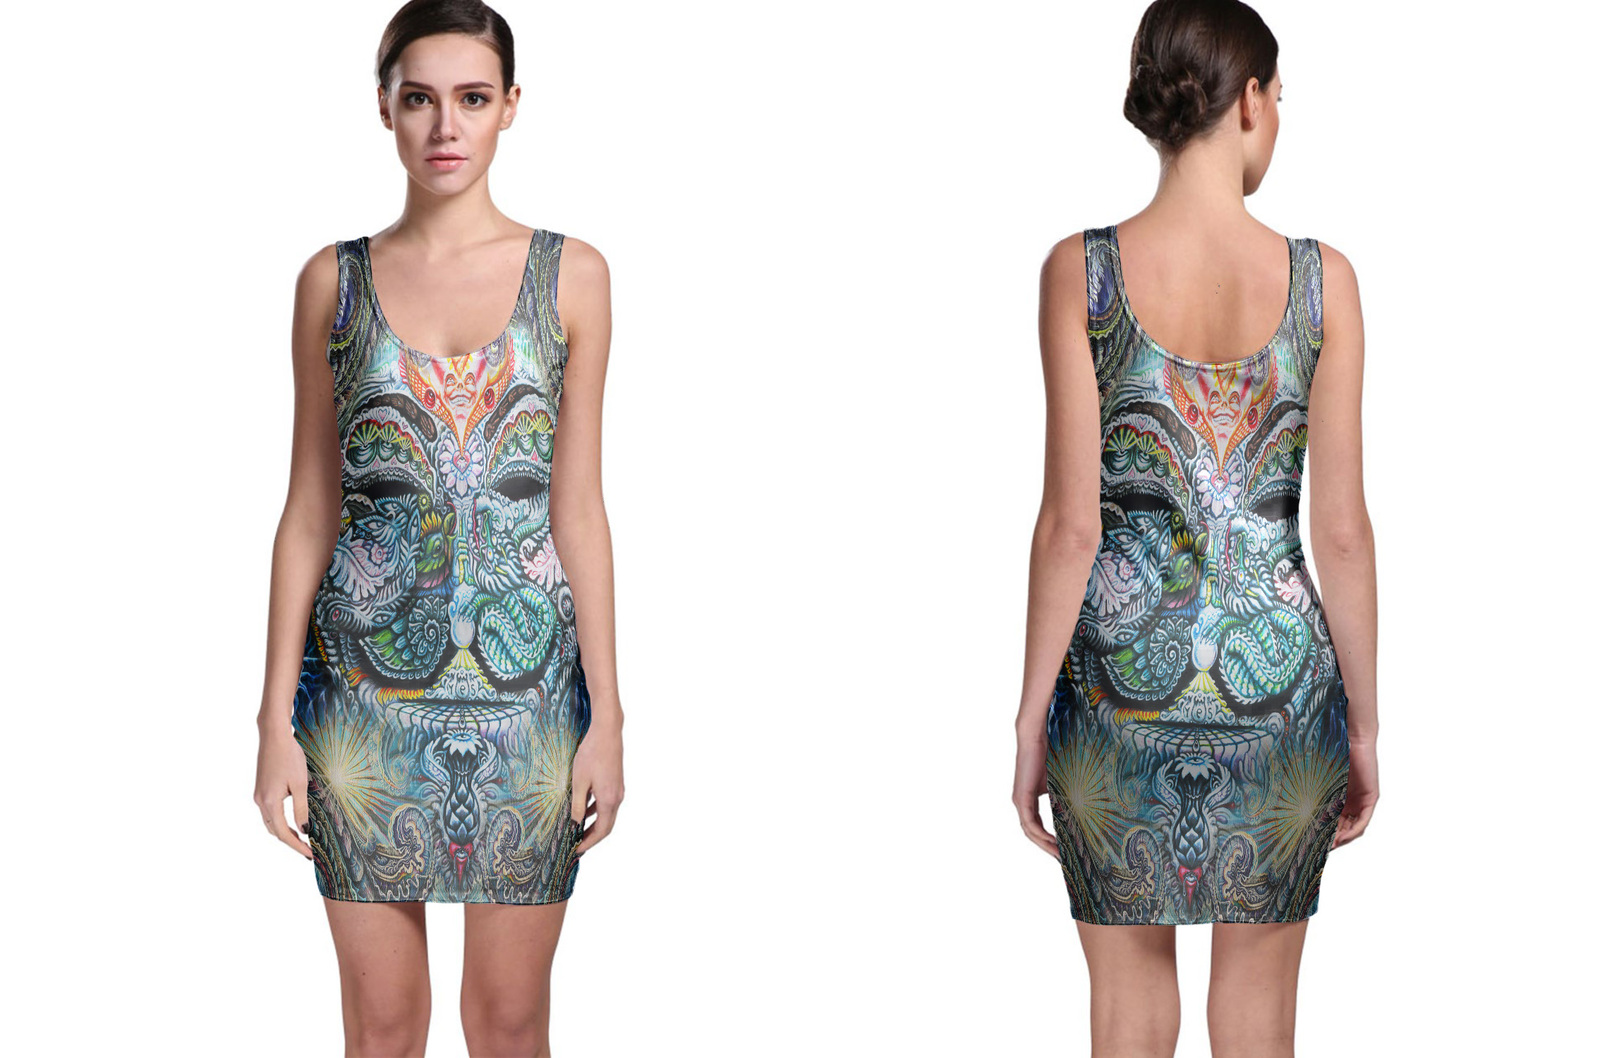 DMT anonymous Psychedelic Hallucinogen Bodycon Dress